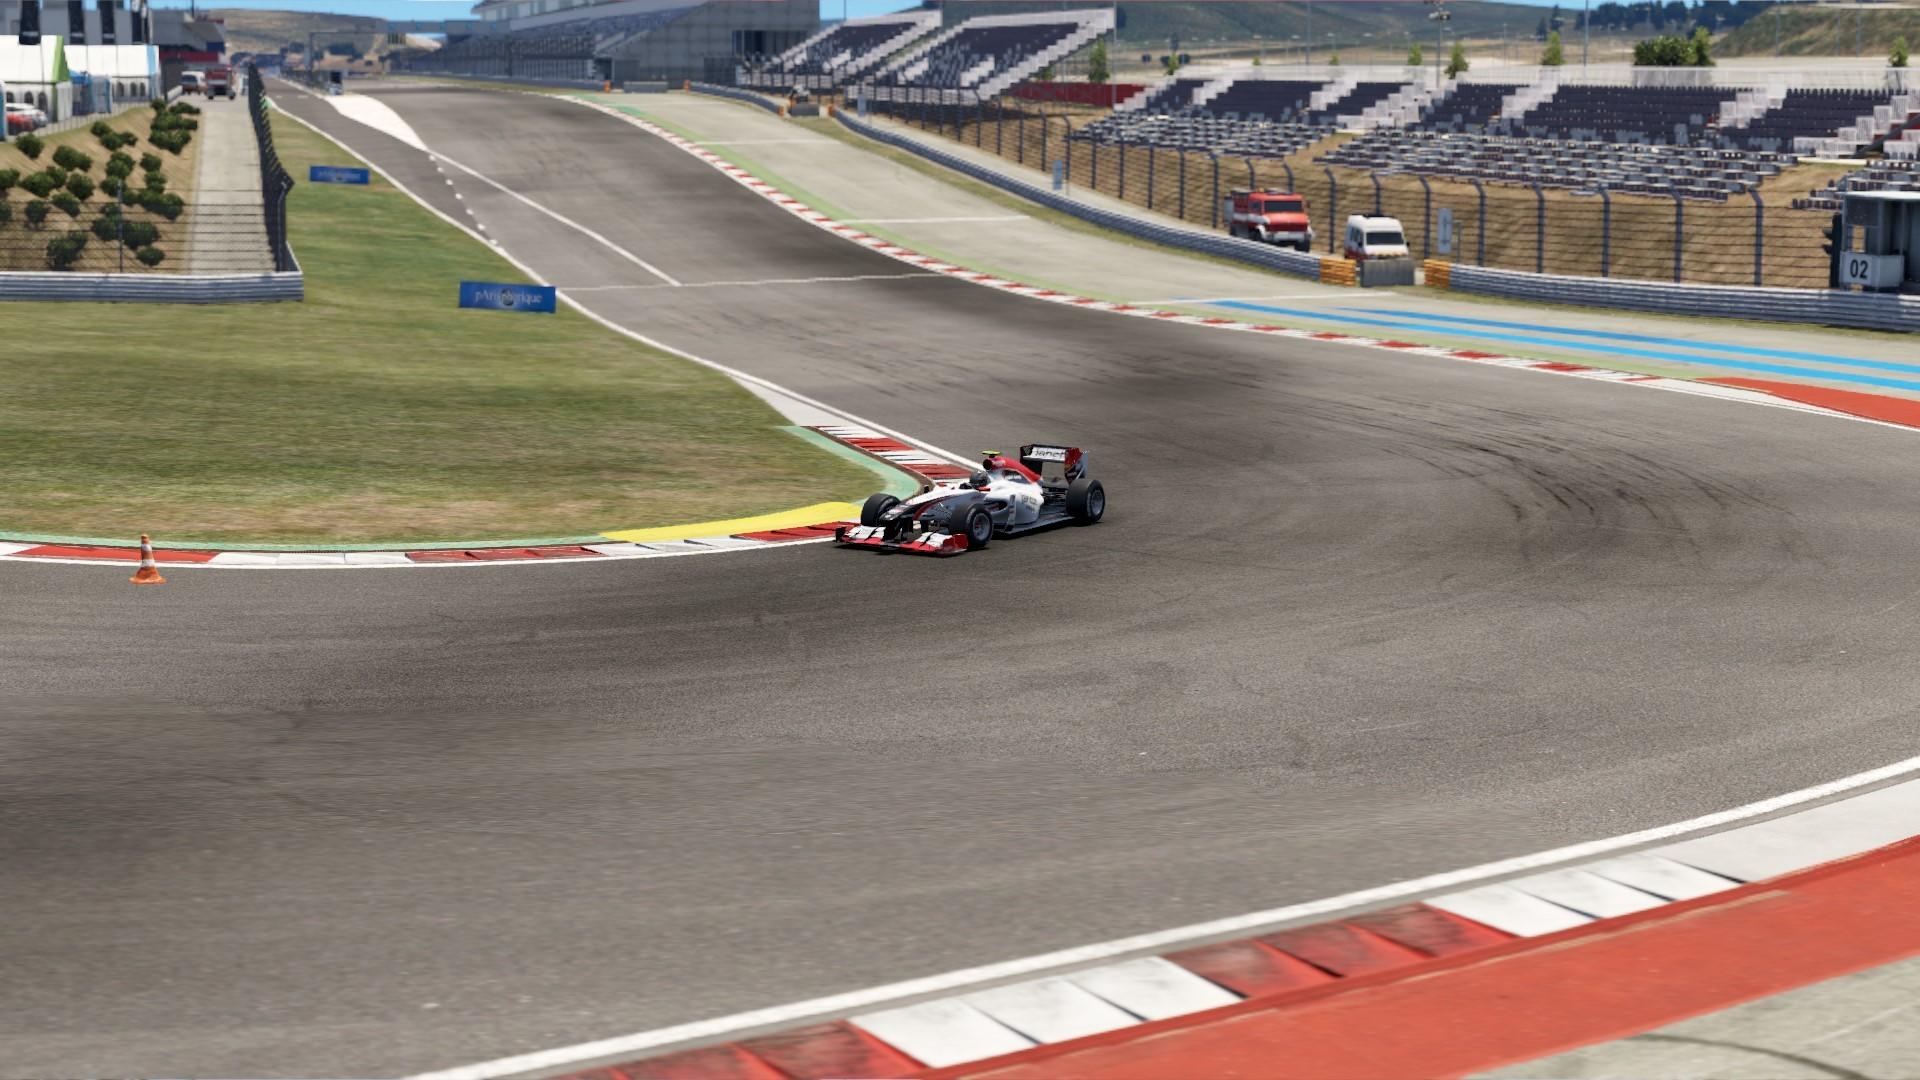 F1 car in turn 1